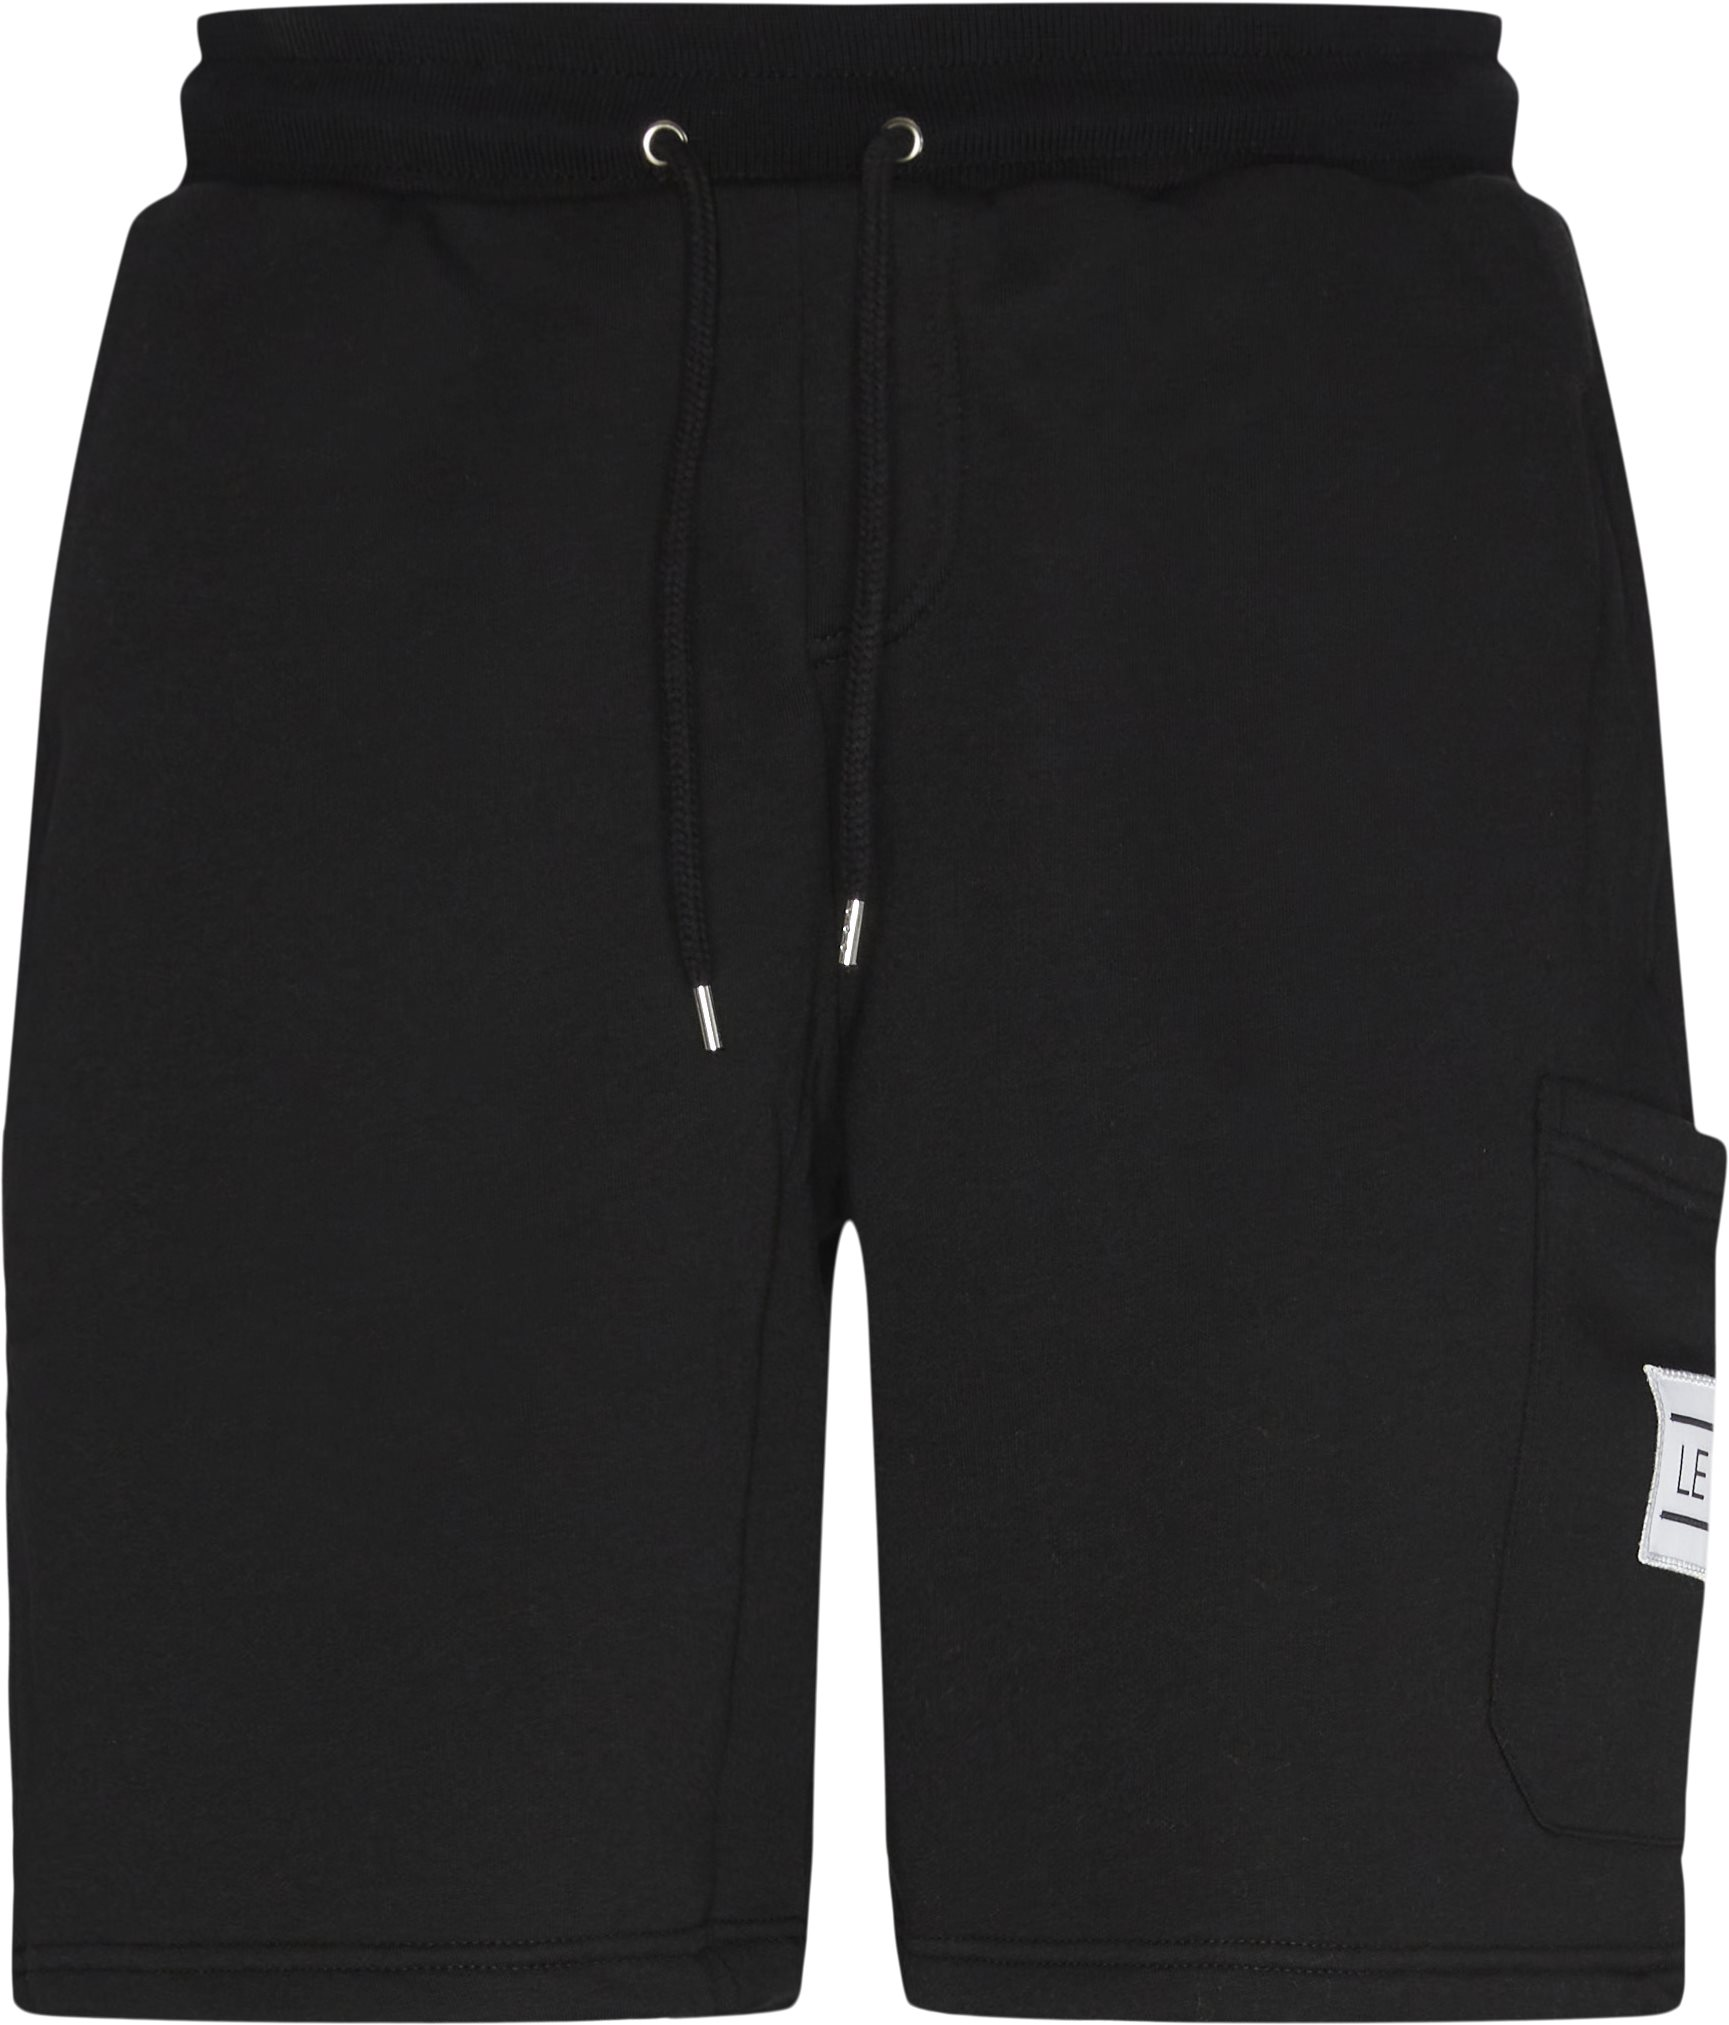 Alain Sweatshorts - Shorts - Regular fit - Sort